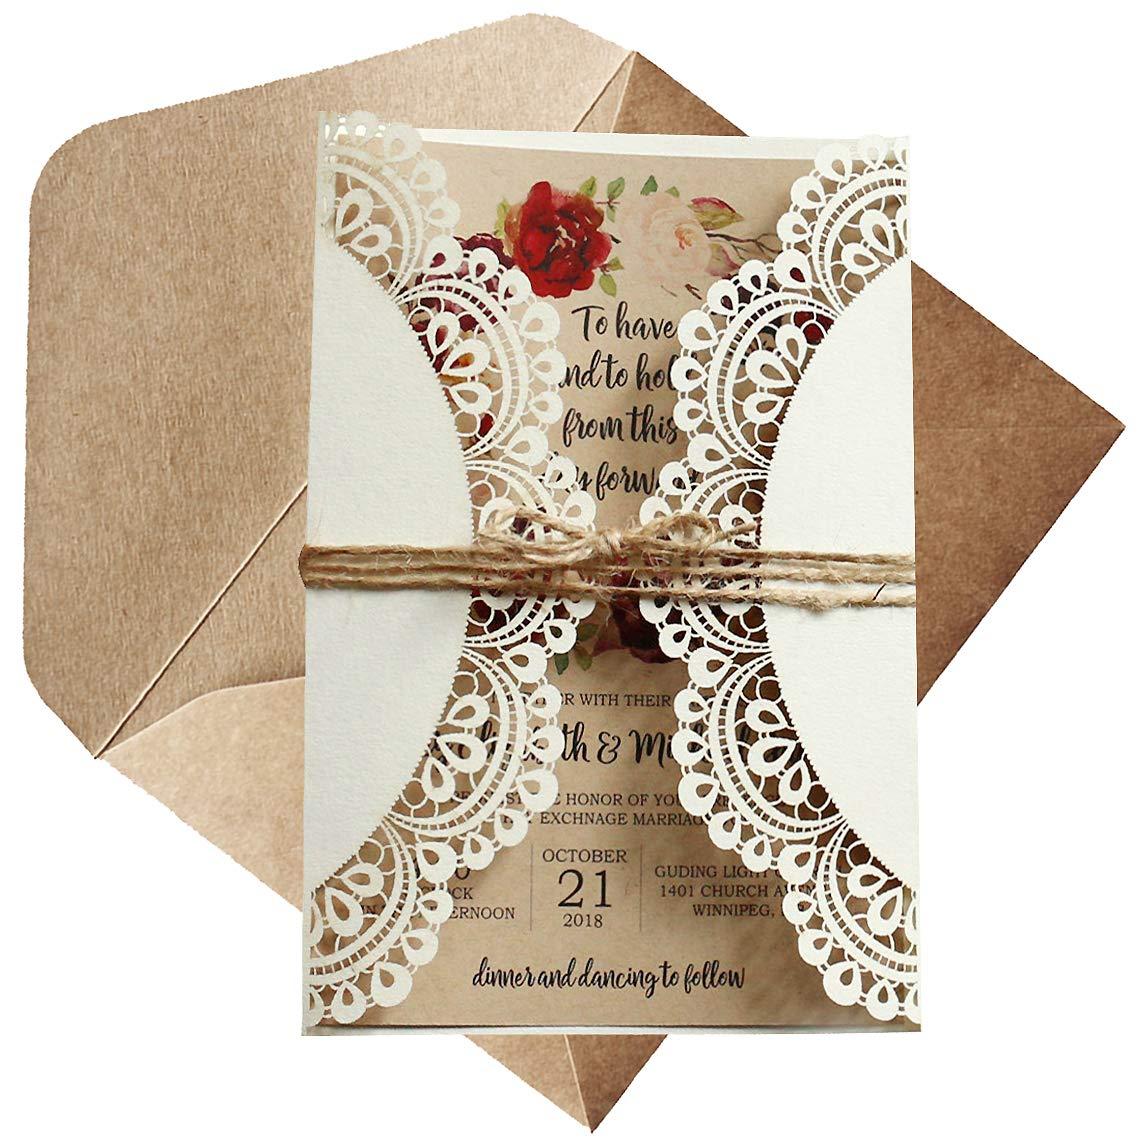 Off White Rustic Wedding Invitations Kraft Paper Invitation Cards Laser-Cut Invitations DIY Bridal Shower Invites - Set of 50 pcs (Blank Invitations)